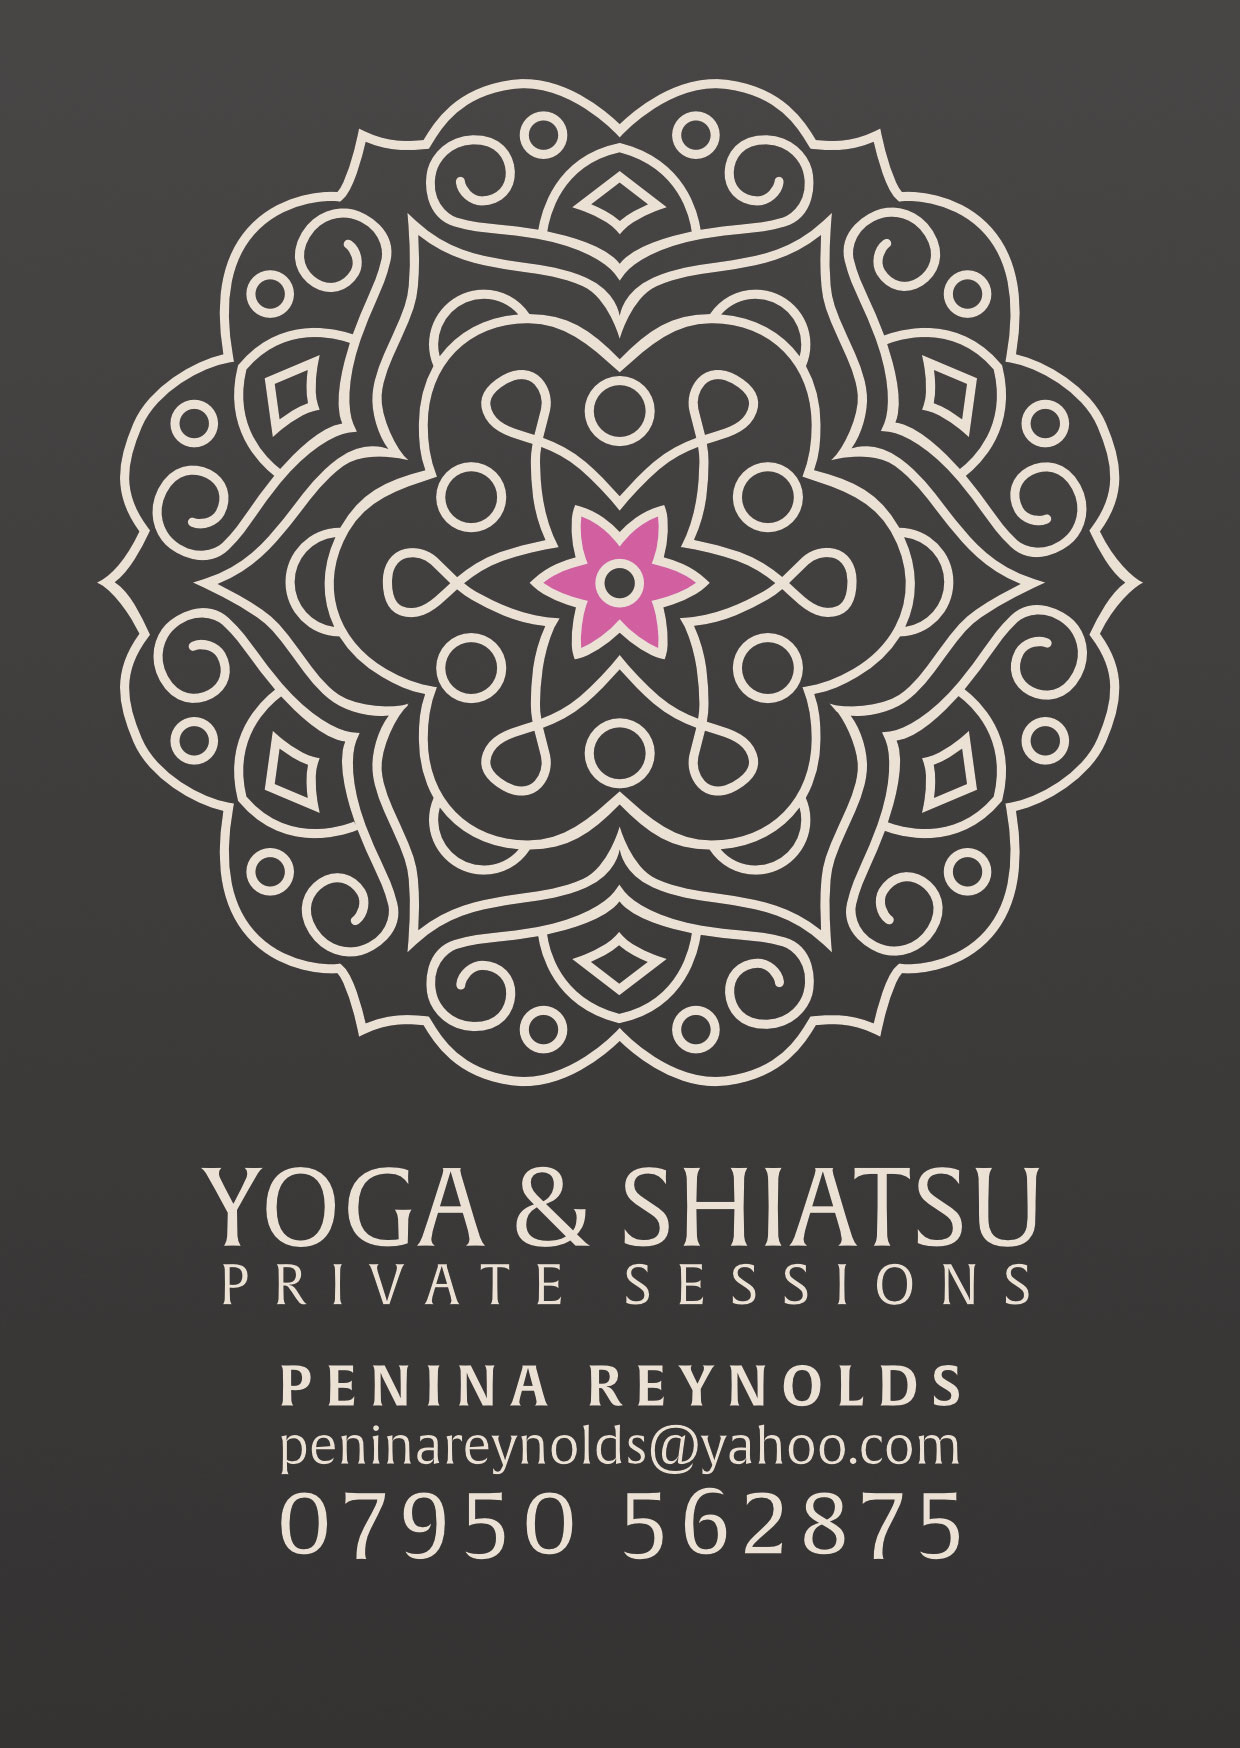 Yoga & shiatsu flyer design